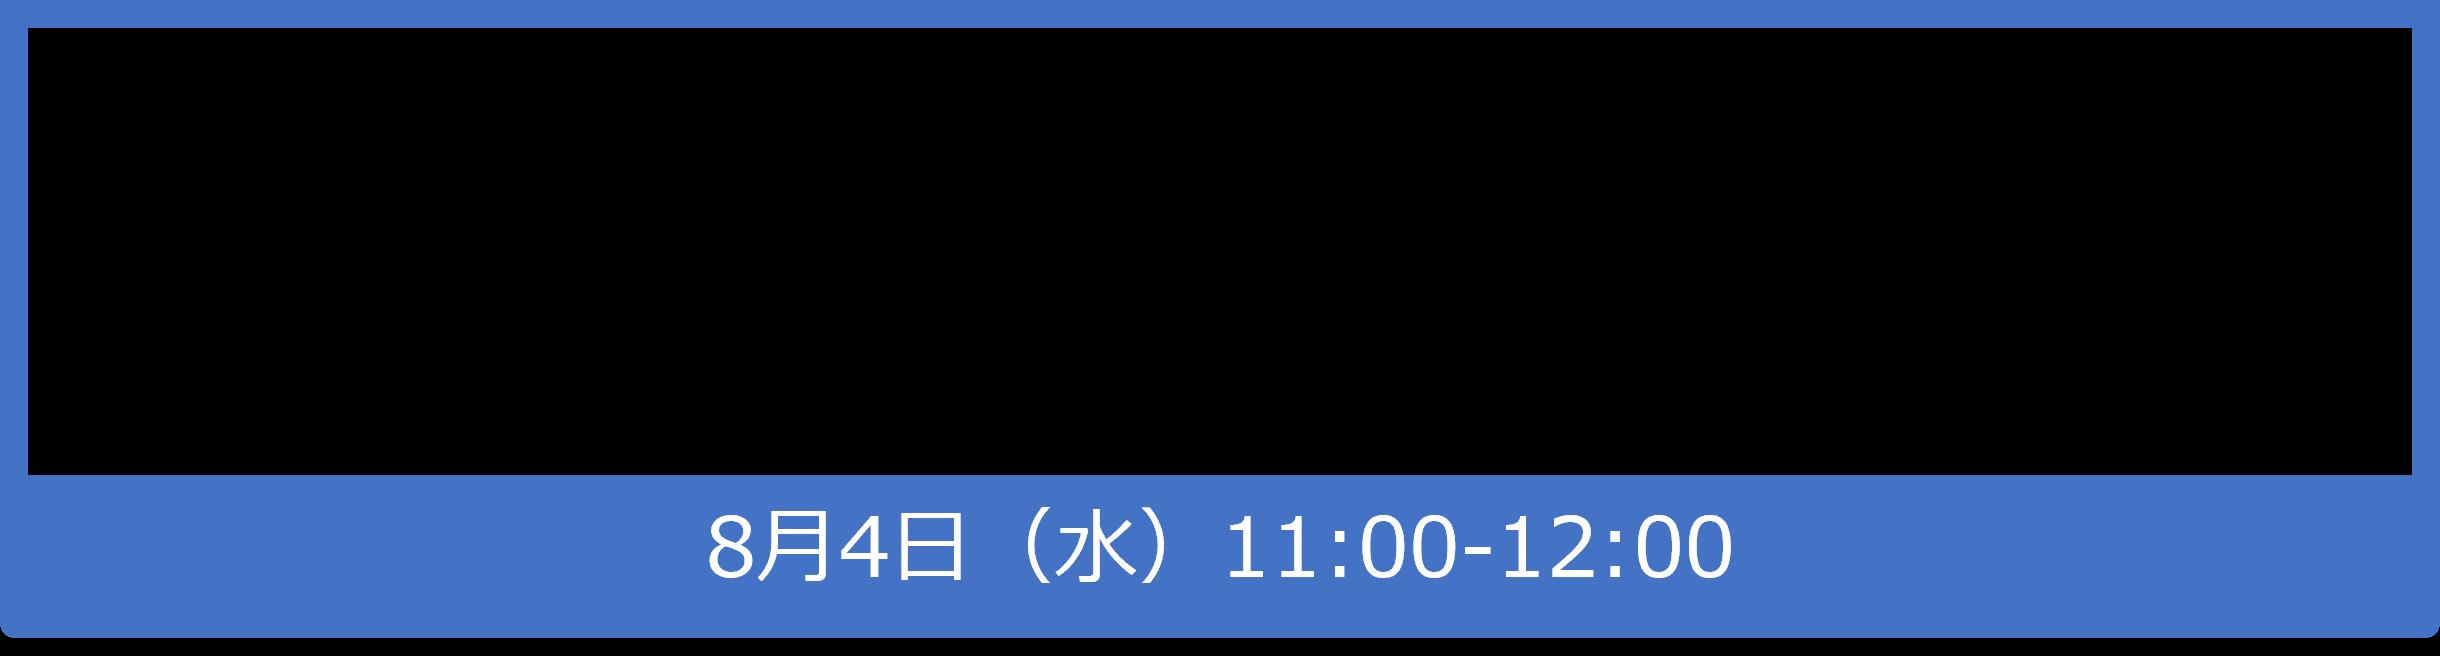 HiramekiWorks 新機能紹介セミナー 共催:株式会社くいんと・株式会社構造計画研究所